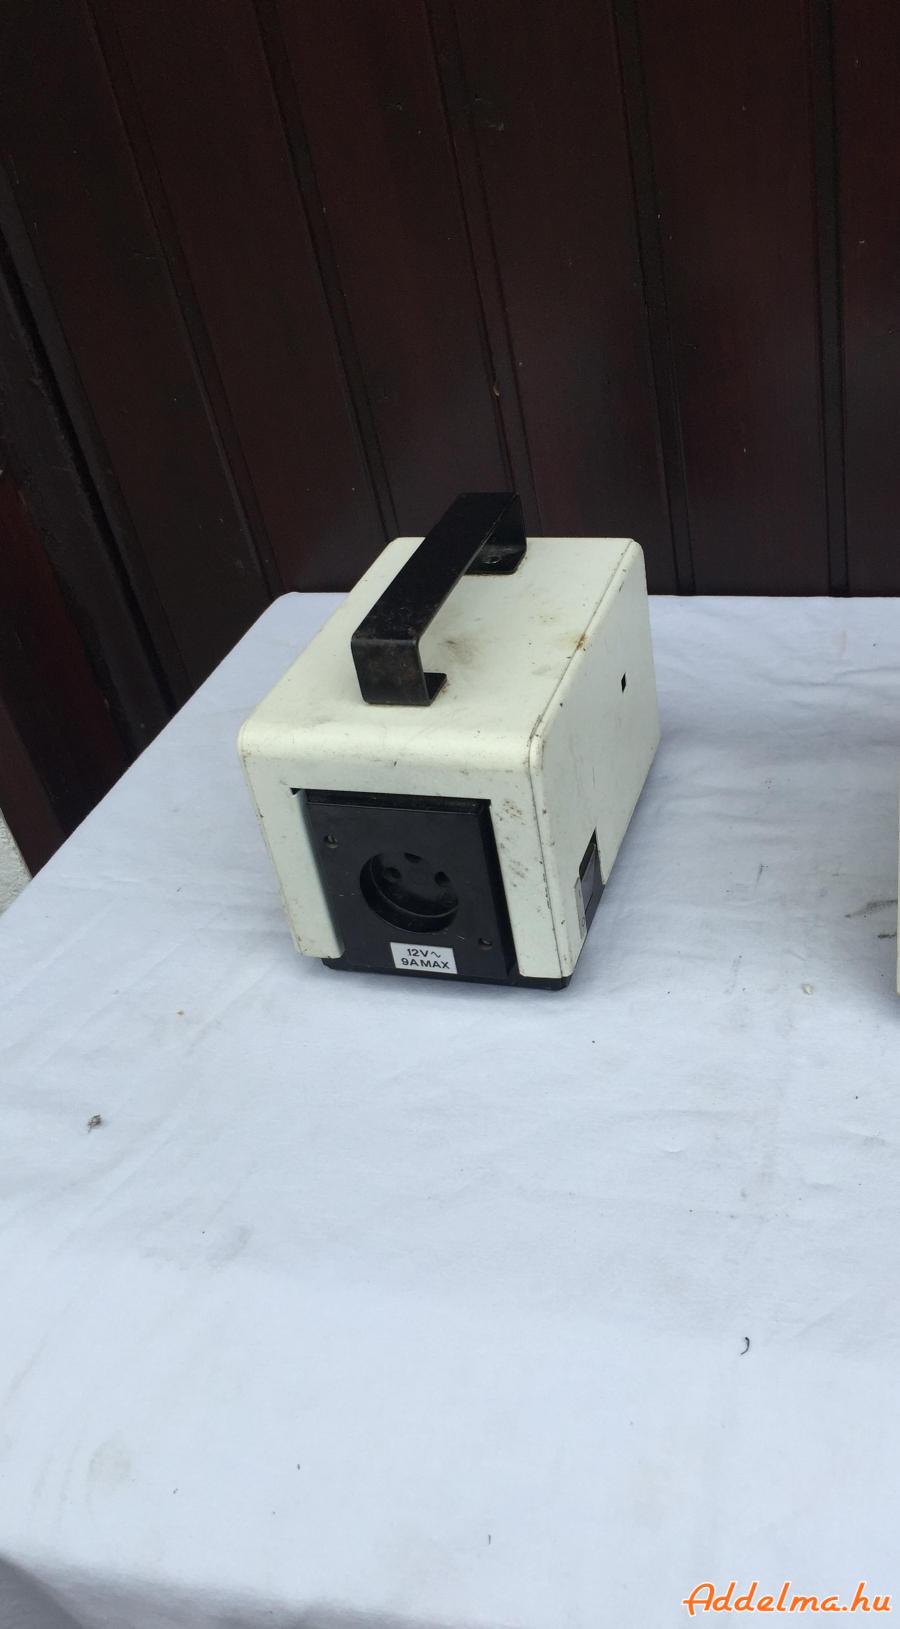 12V-os Hordozható transzformátor Meopta